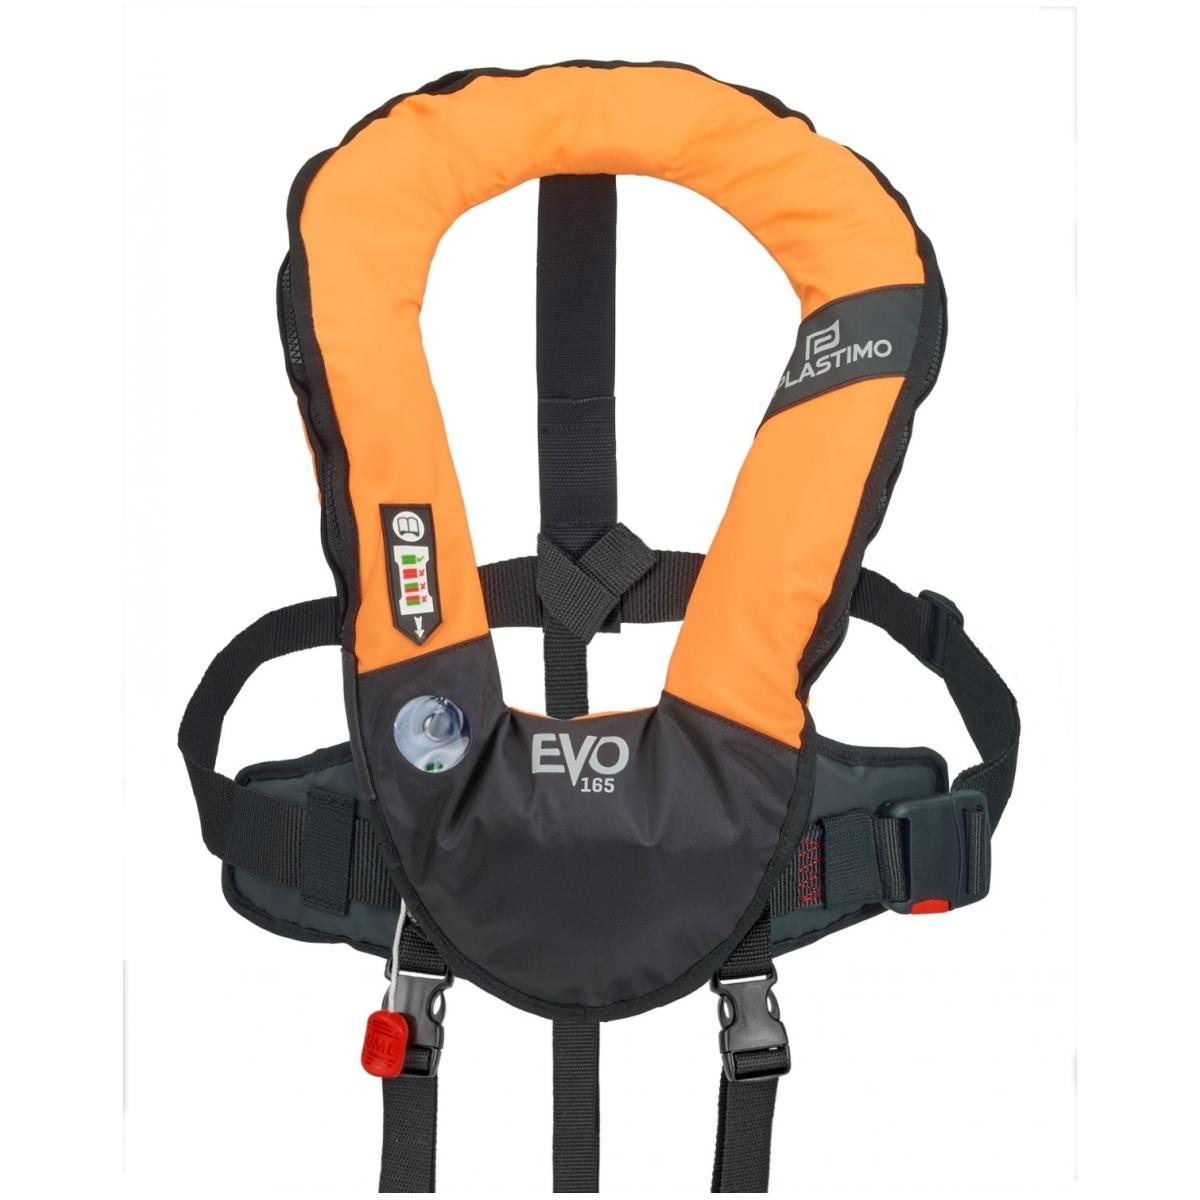 EVO inflatable lifejacket